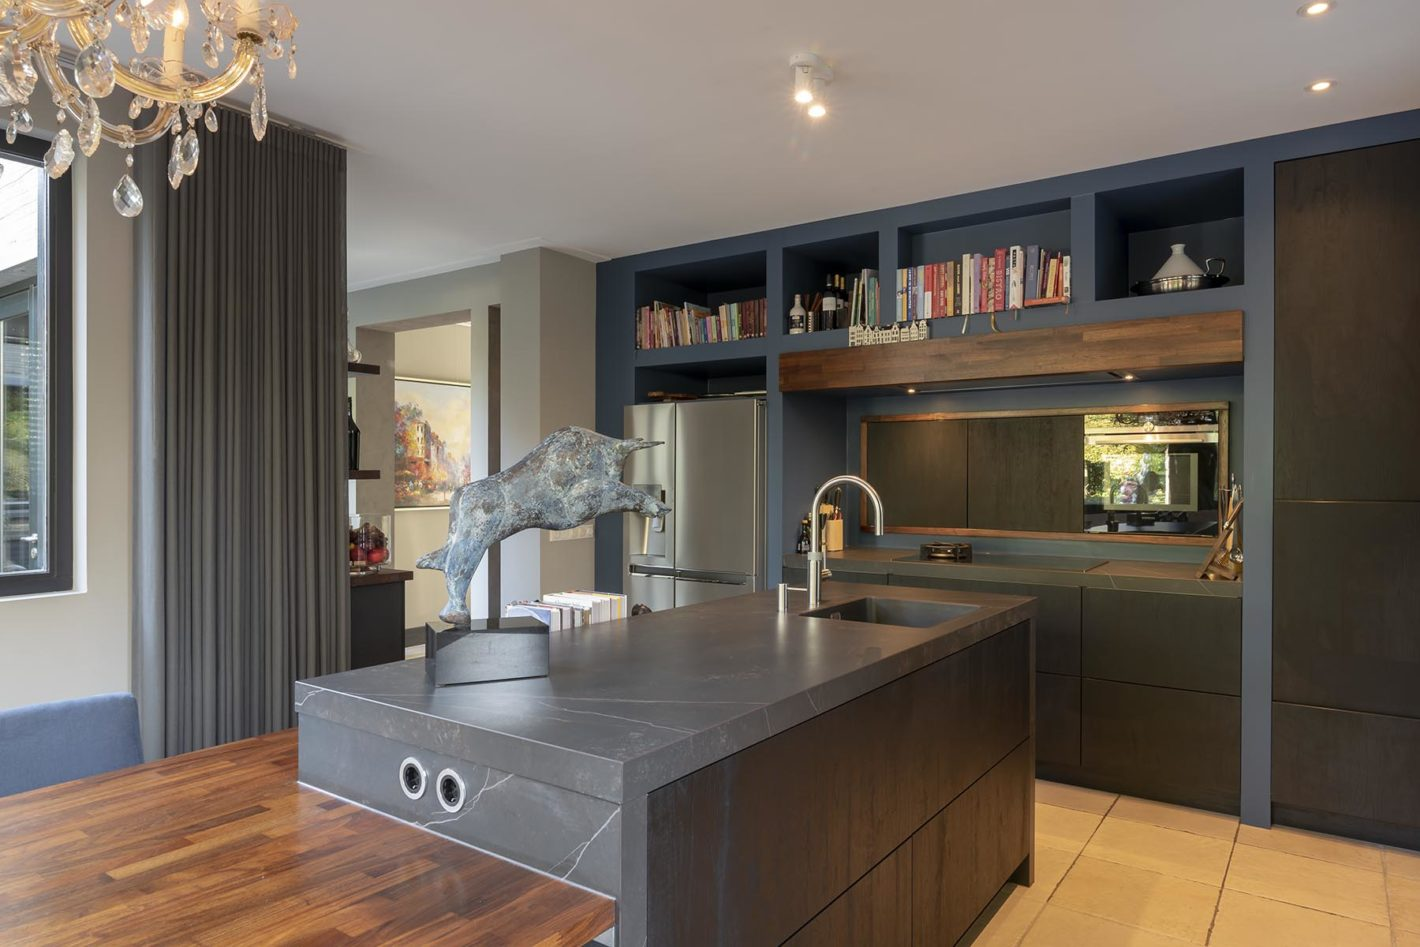 Wonen en werken in de keuken